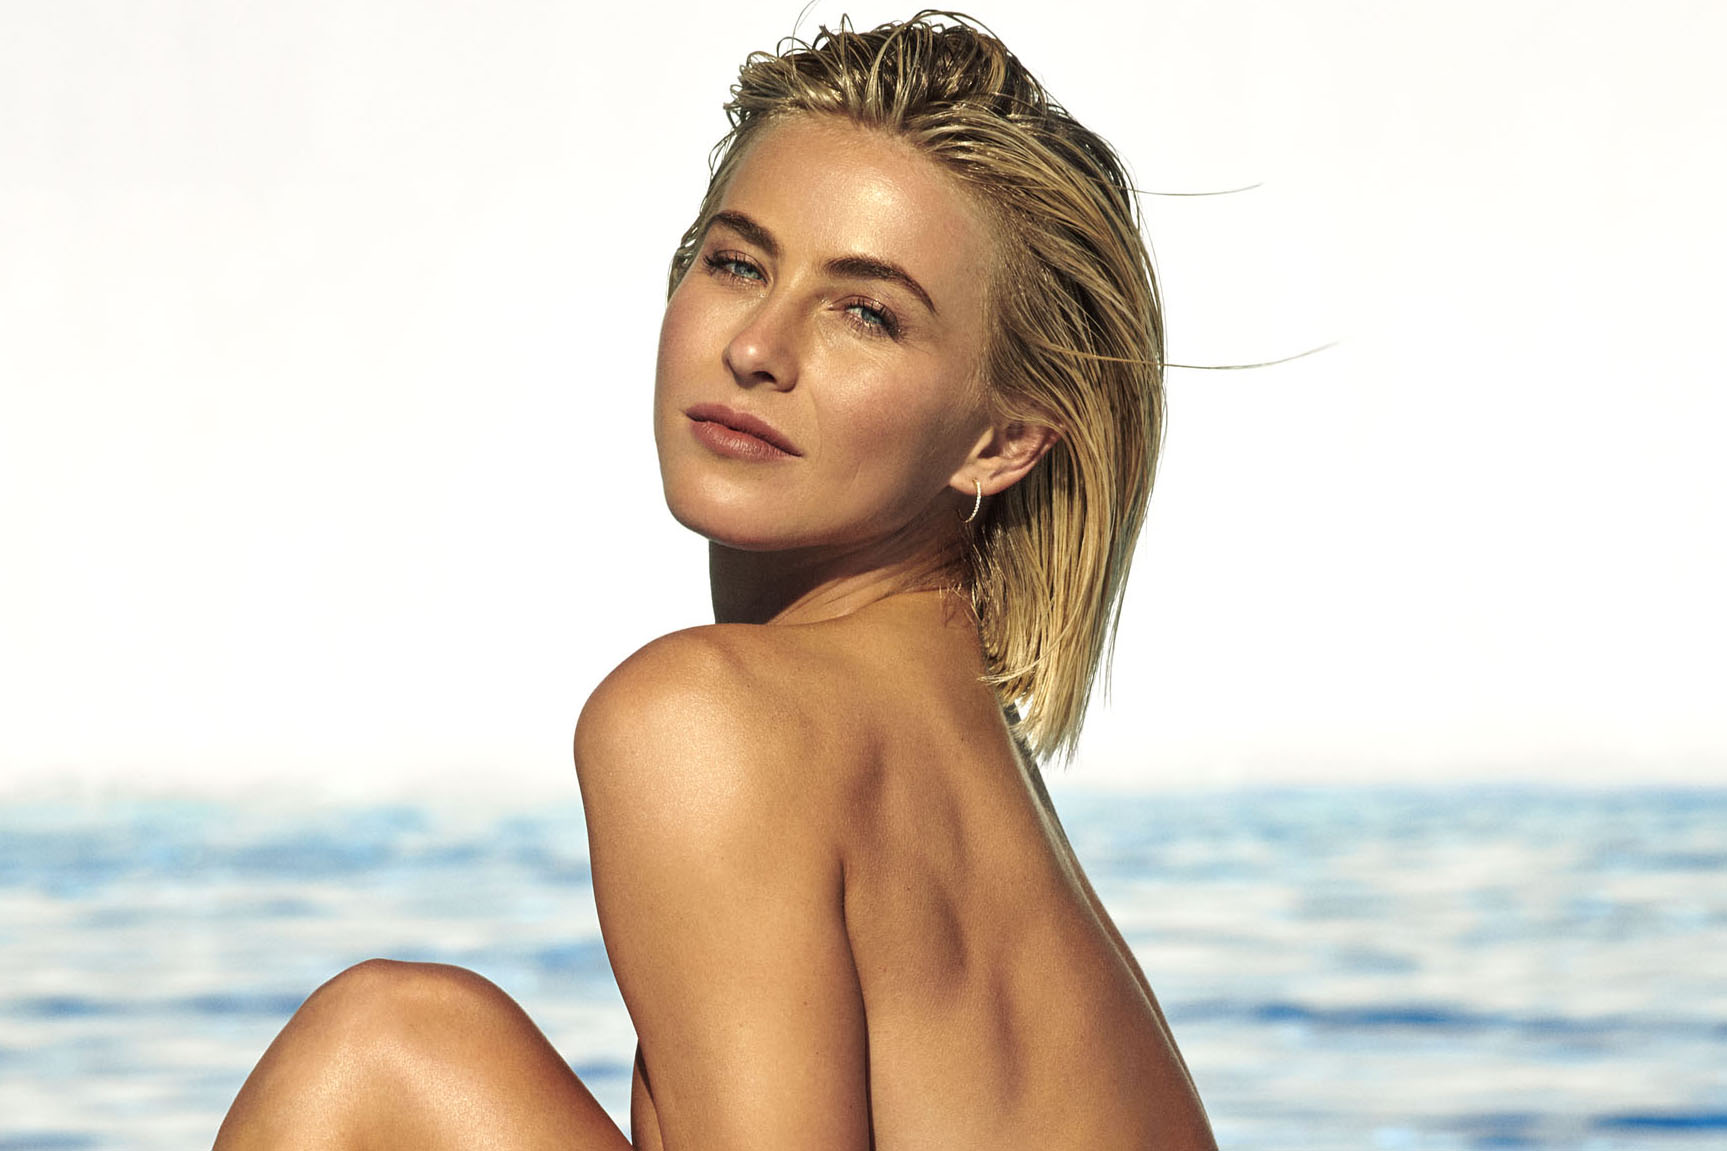 Julianne Hough Topless Instagram photo 25